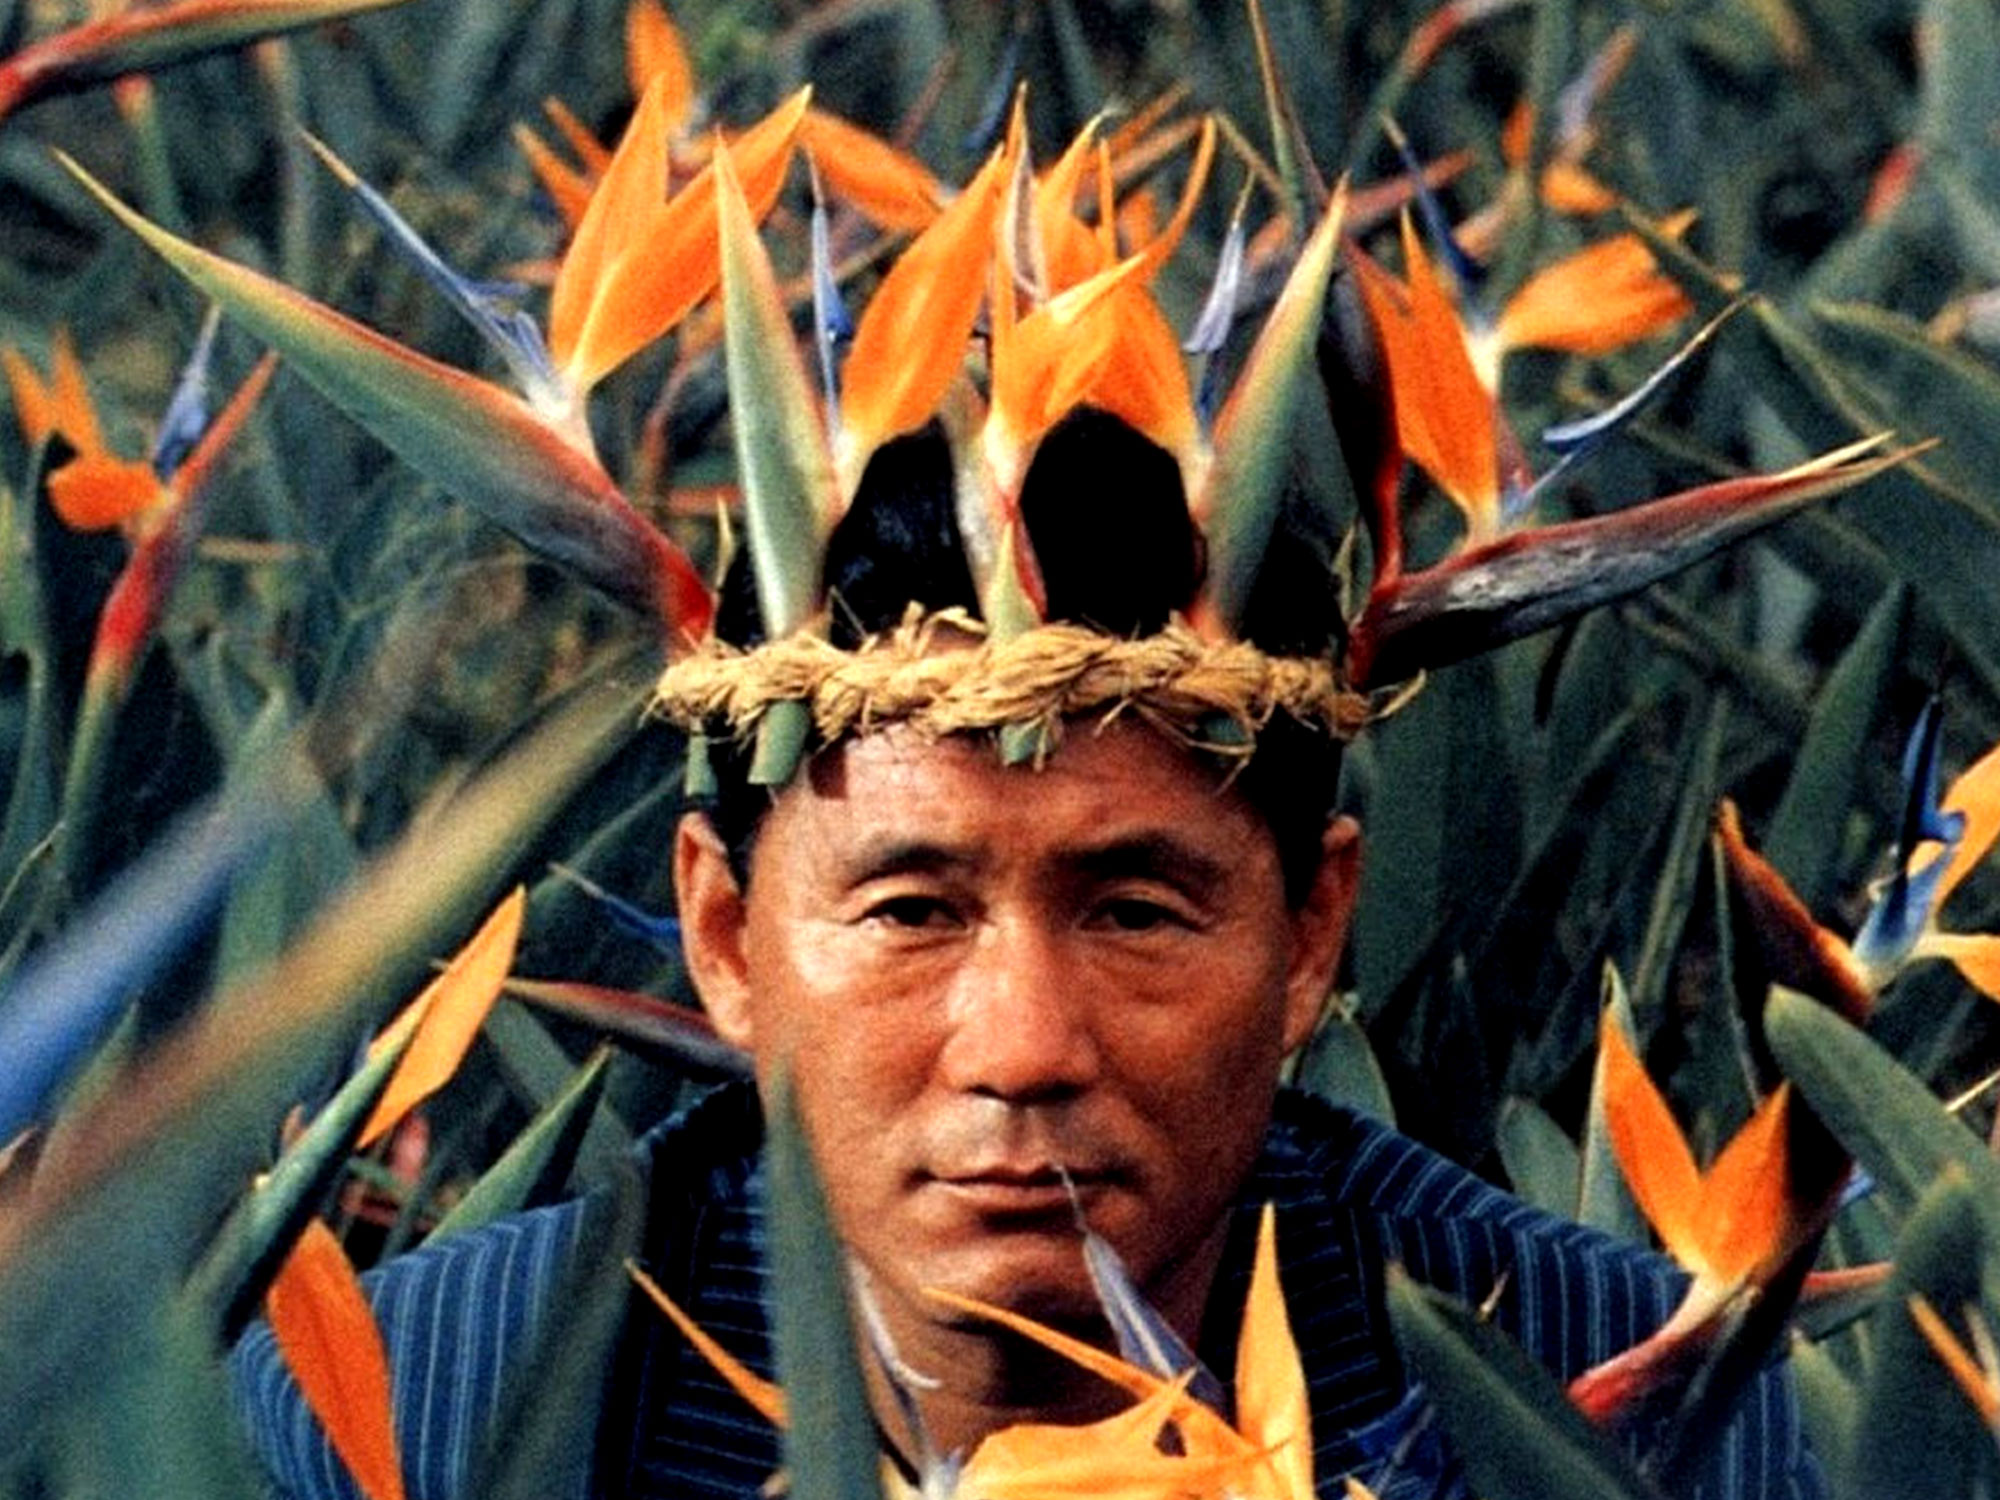 Takeshi Kitano in Boiling Point (1990)